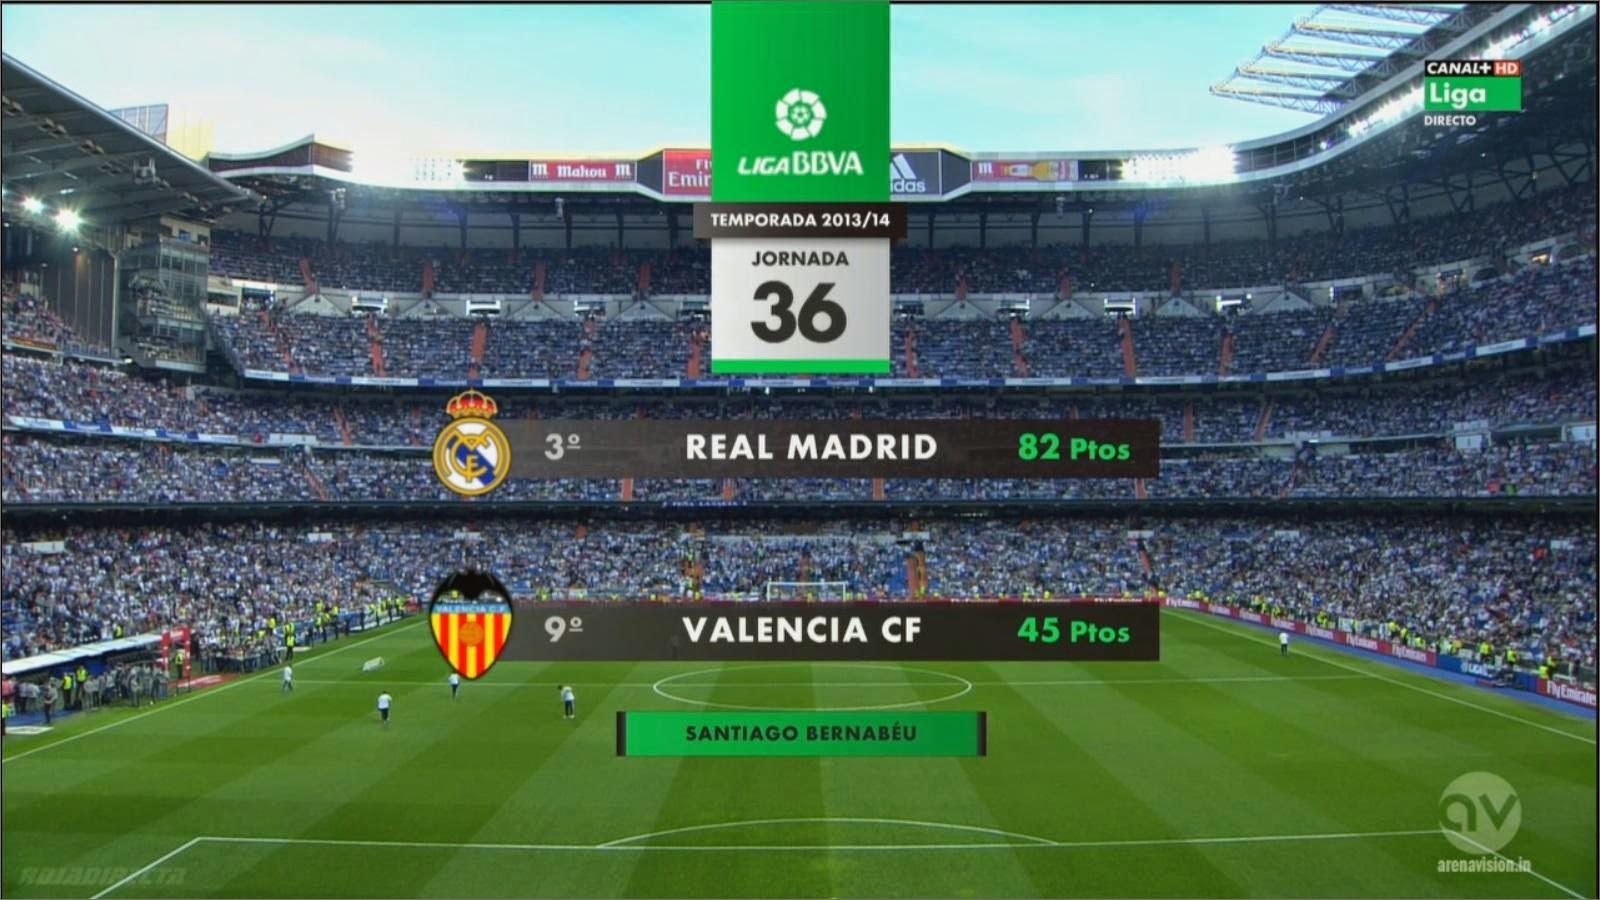 InfoDeportiva - REAL MADRID VS VALENCIA, ONLINE